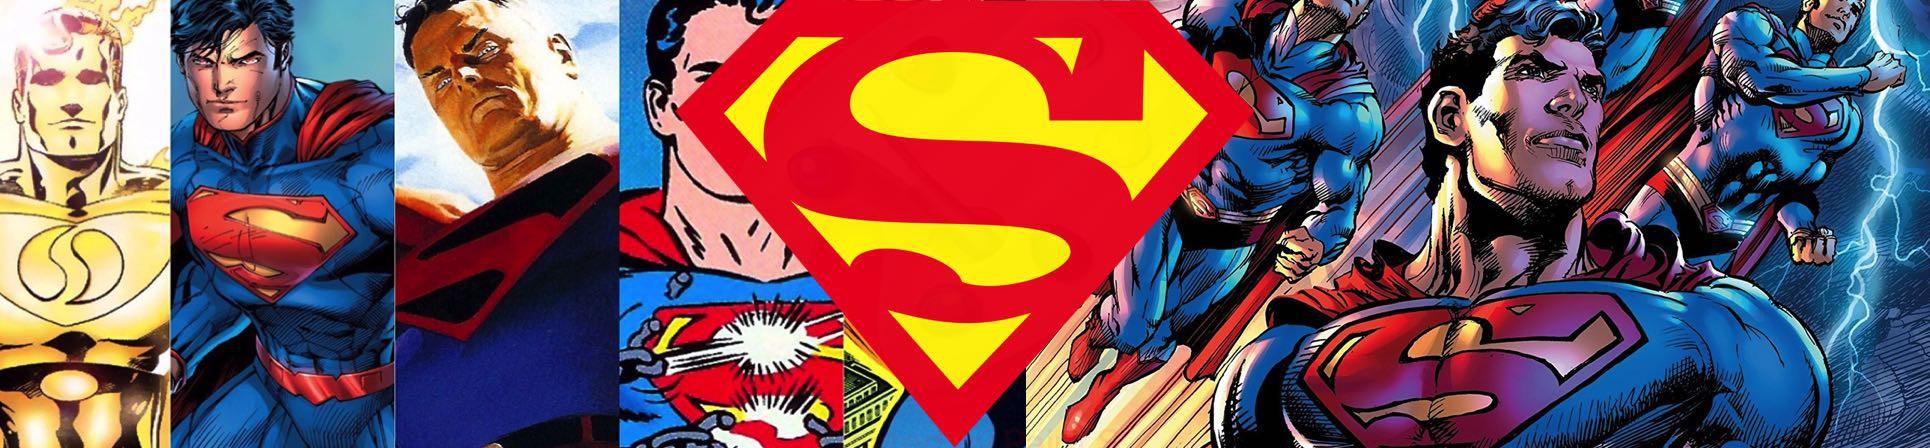 vendita online t-shirt superman